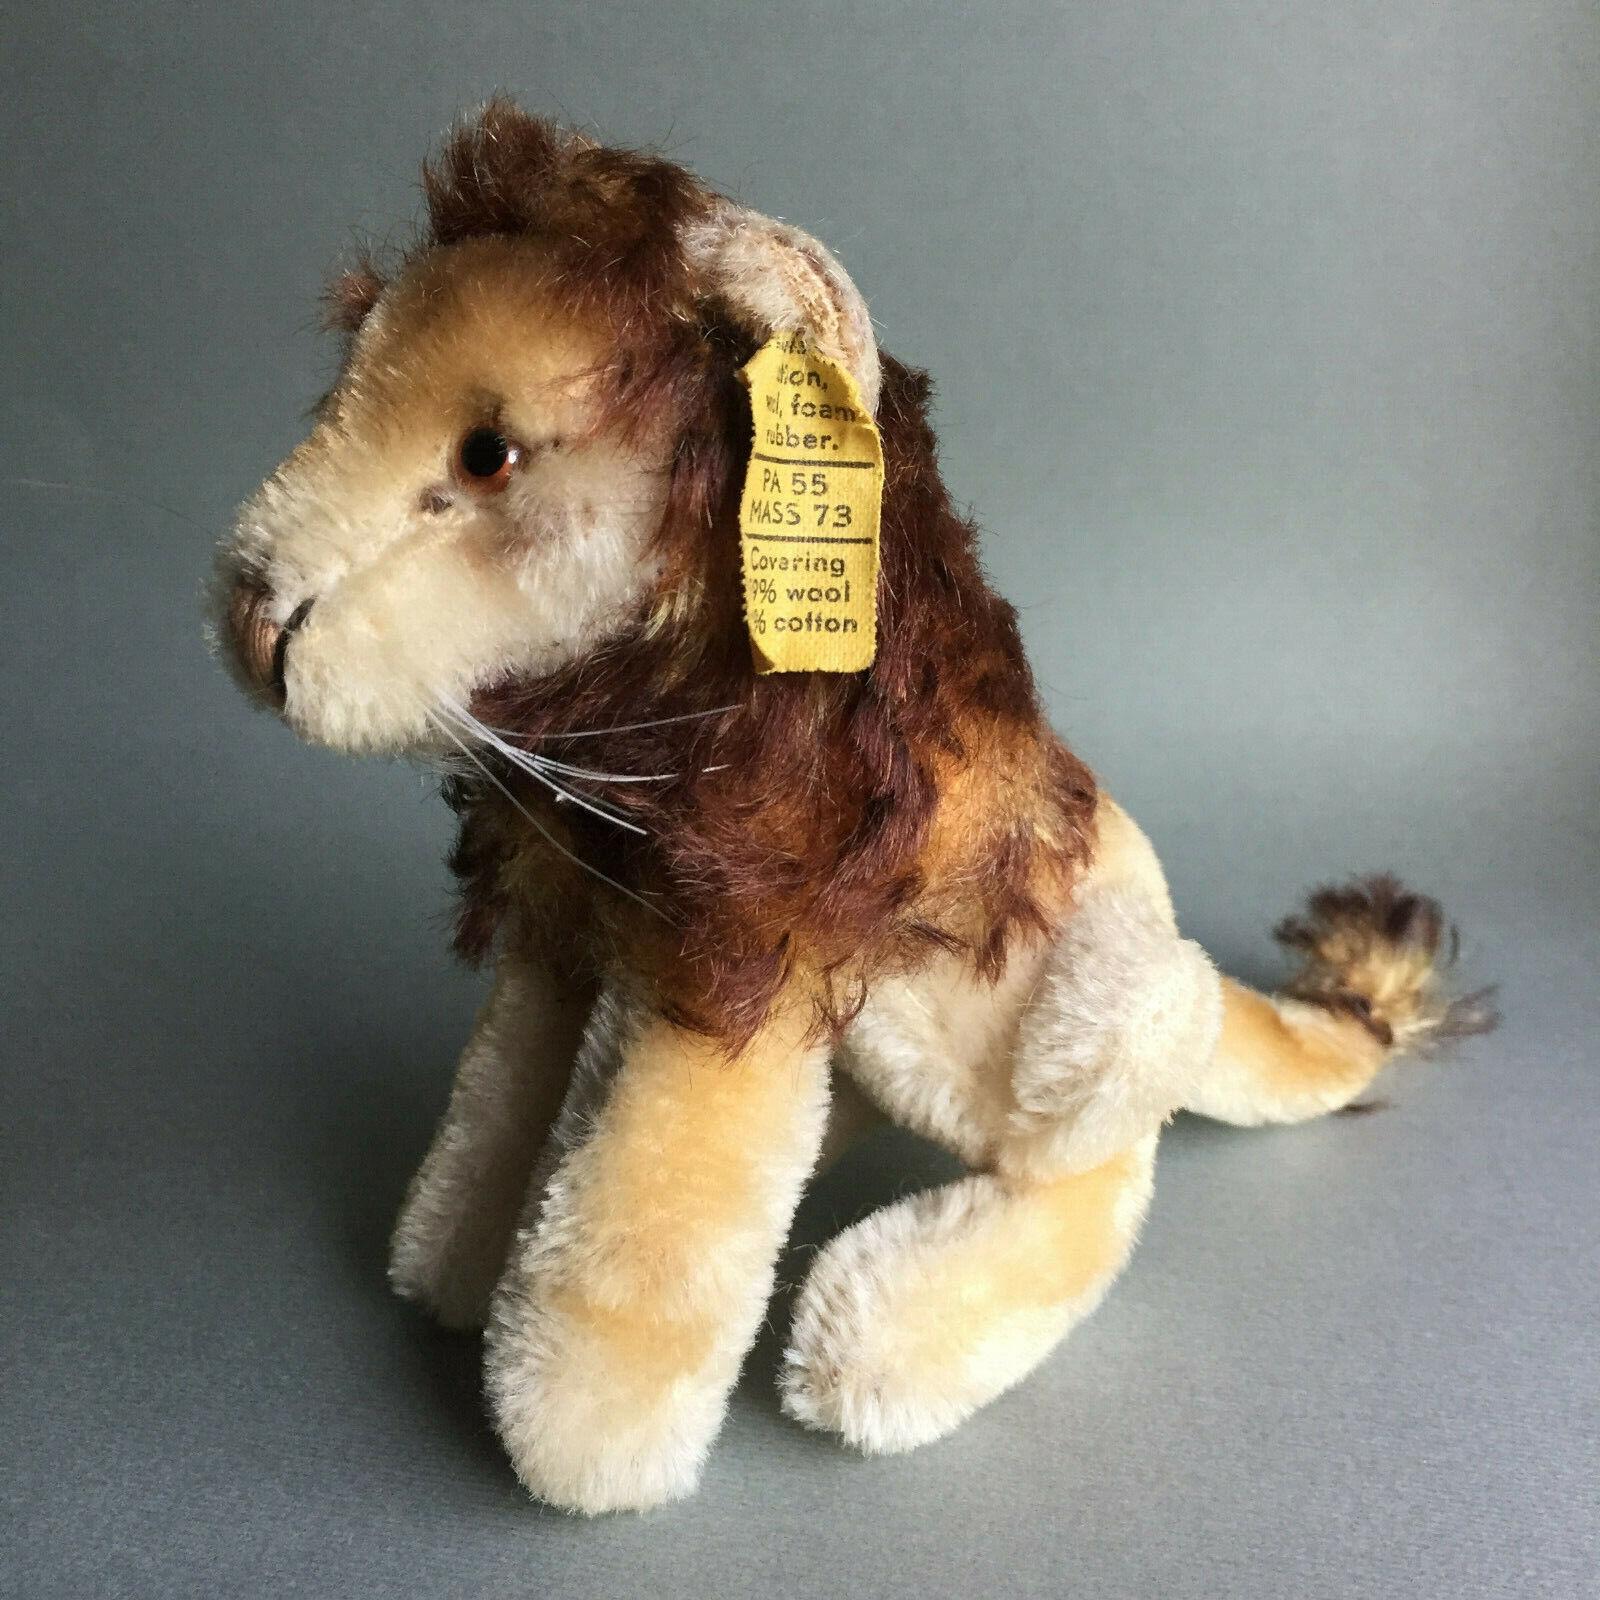 Vintage Steiff Leo Lion 0820 12 Sitting Mohair Plush 12cm 5'' 1960s With ID Flag